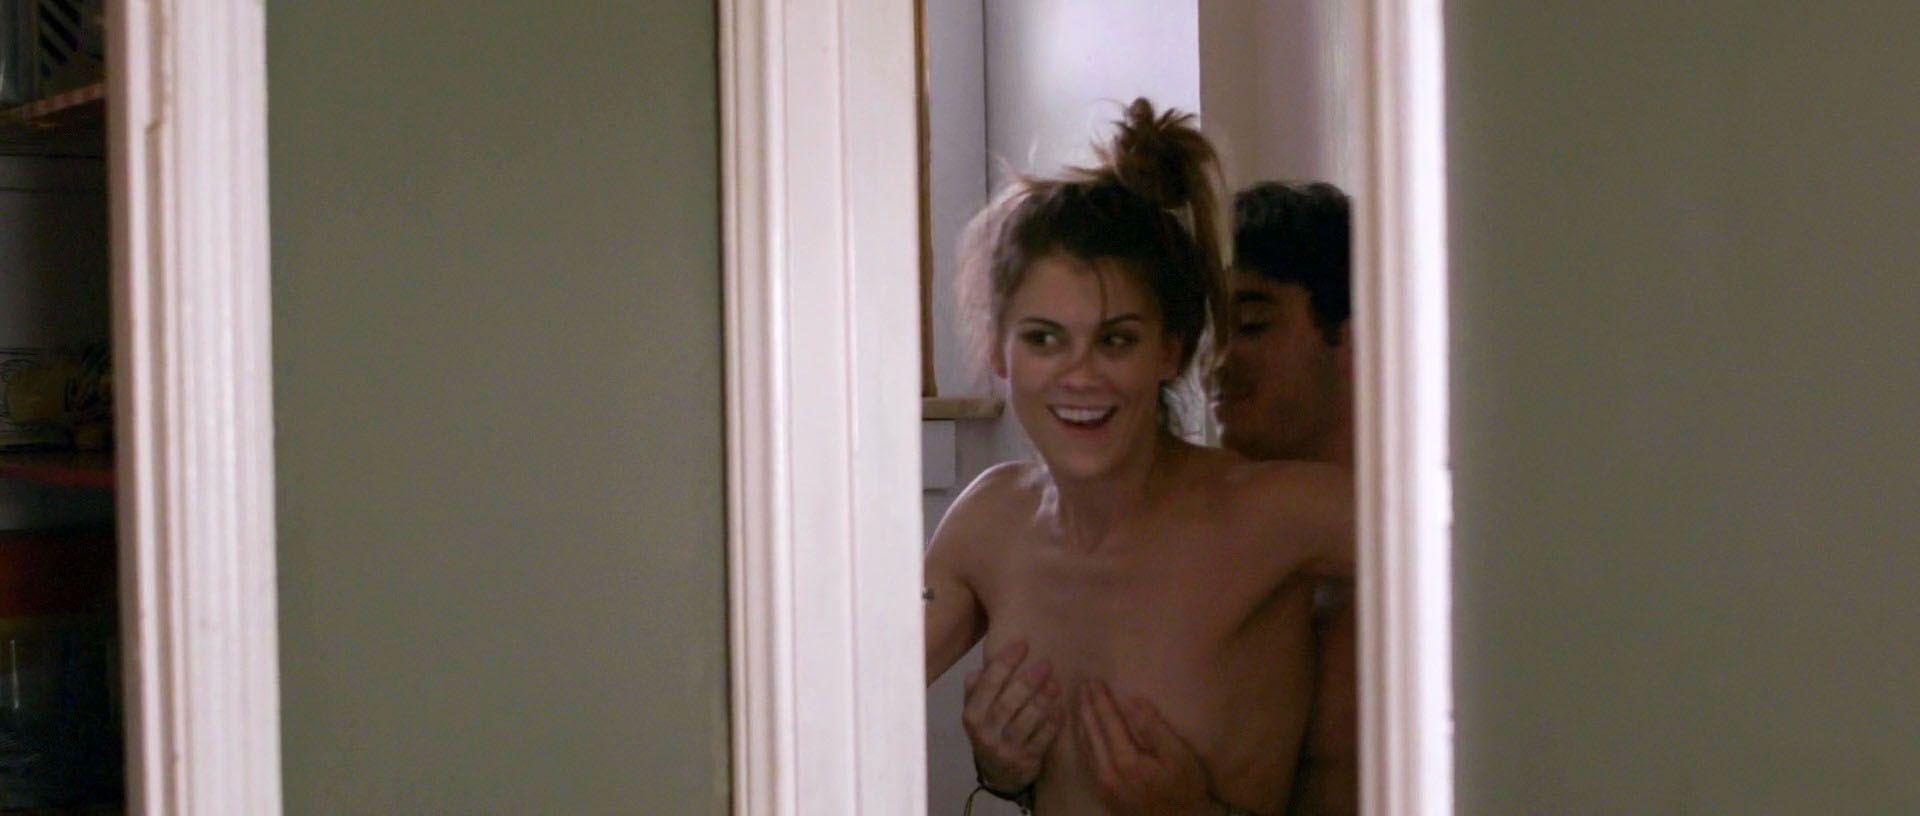 Lindsey-Shaw-Nude-5